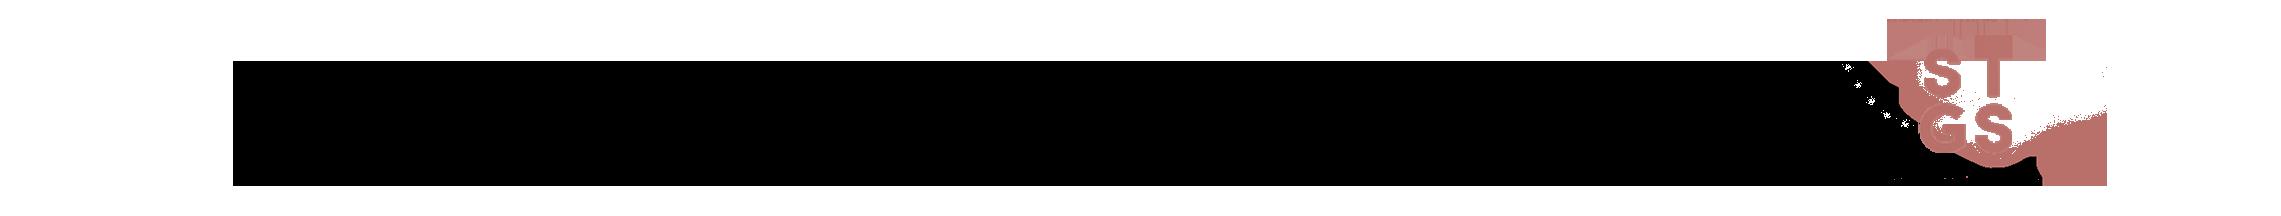 Banner 3_STGS tagline 2